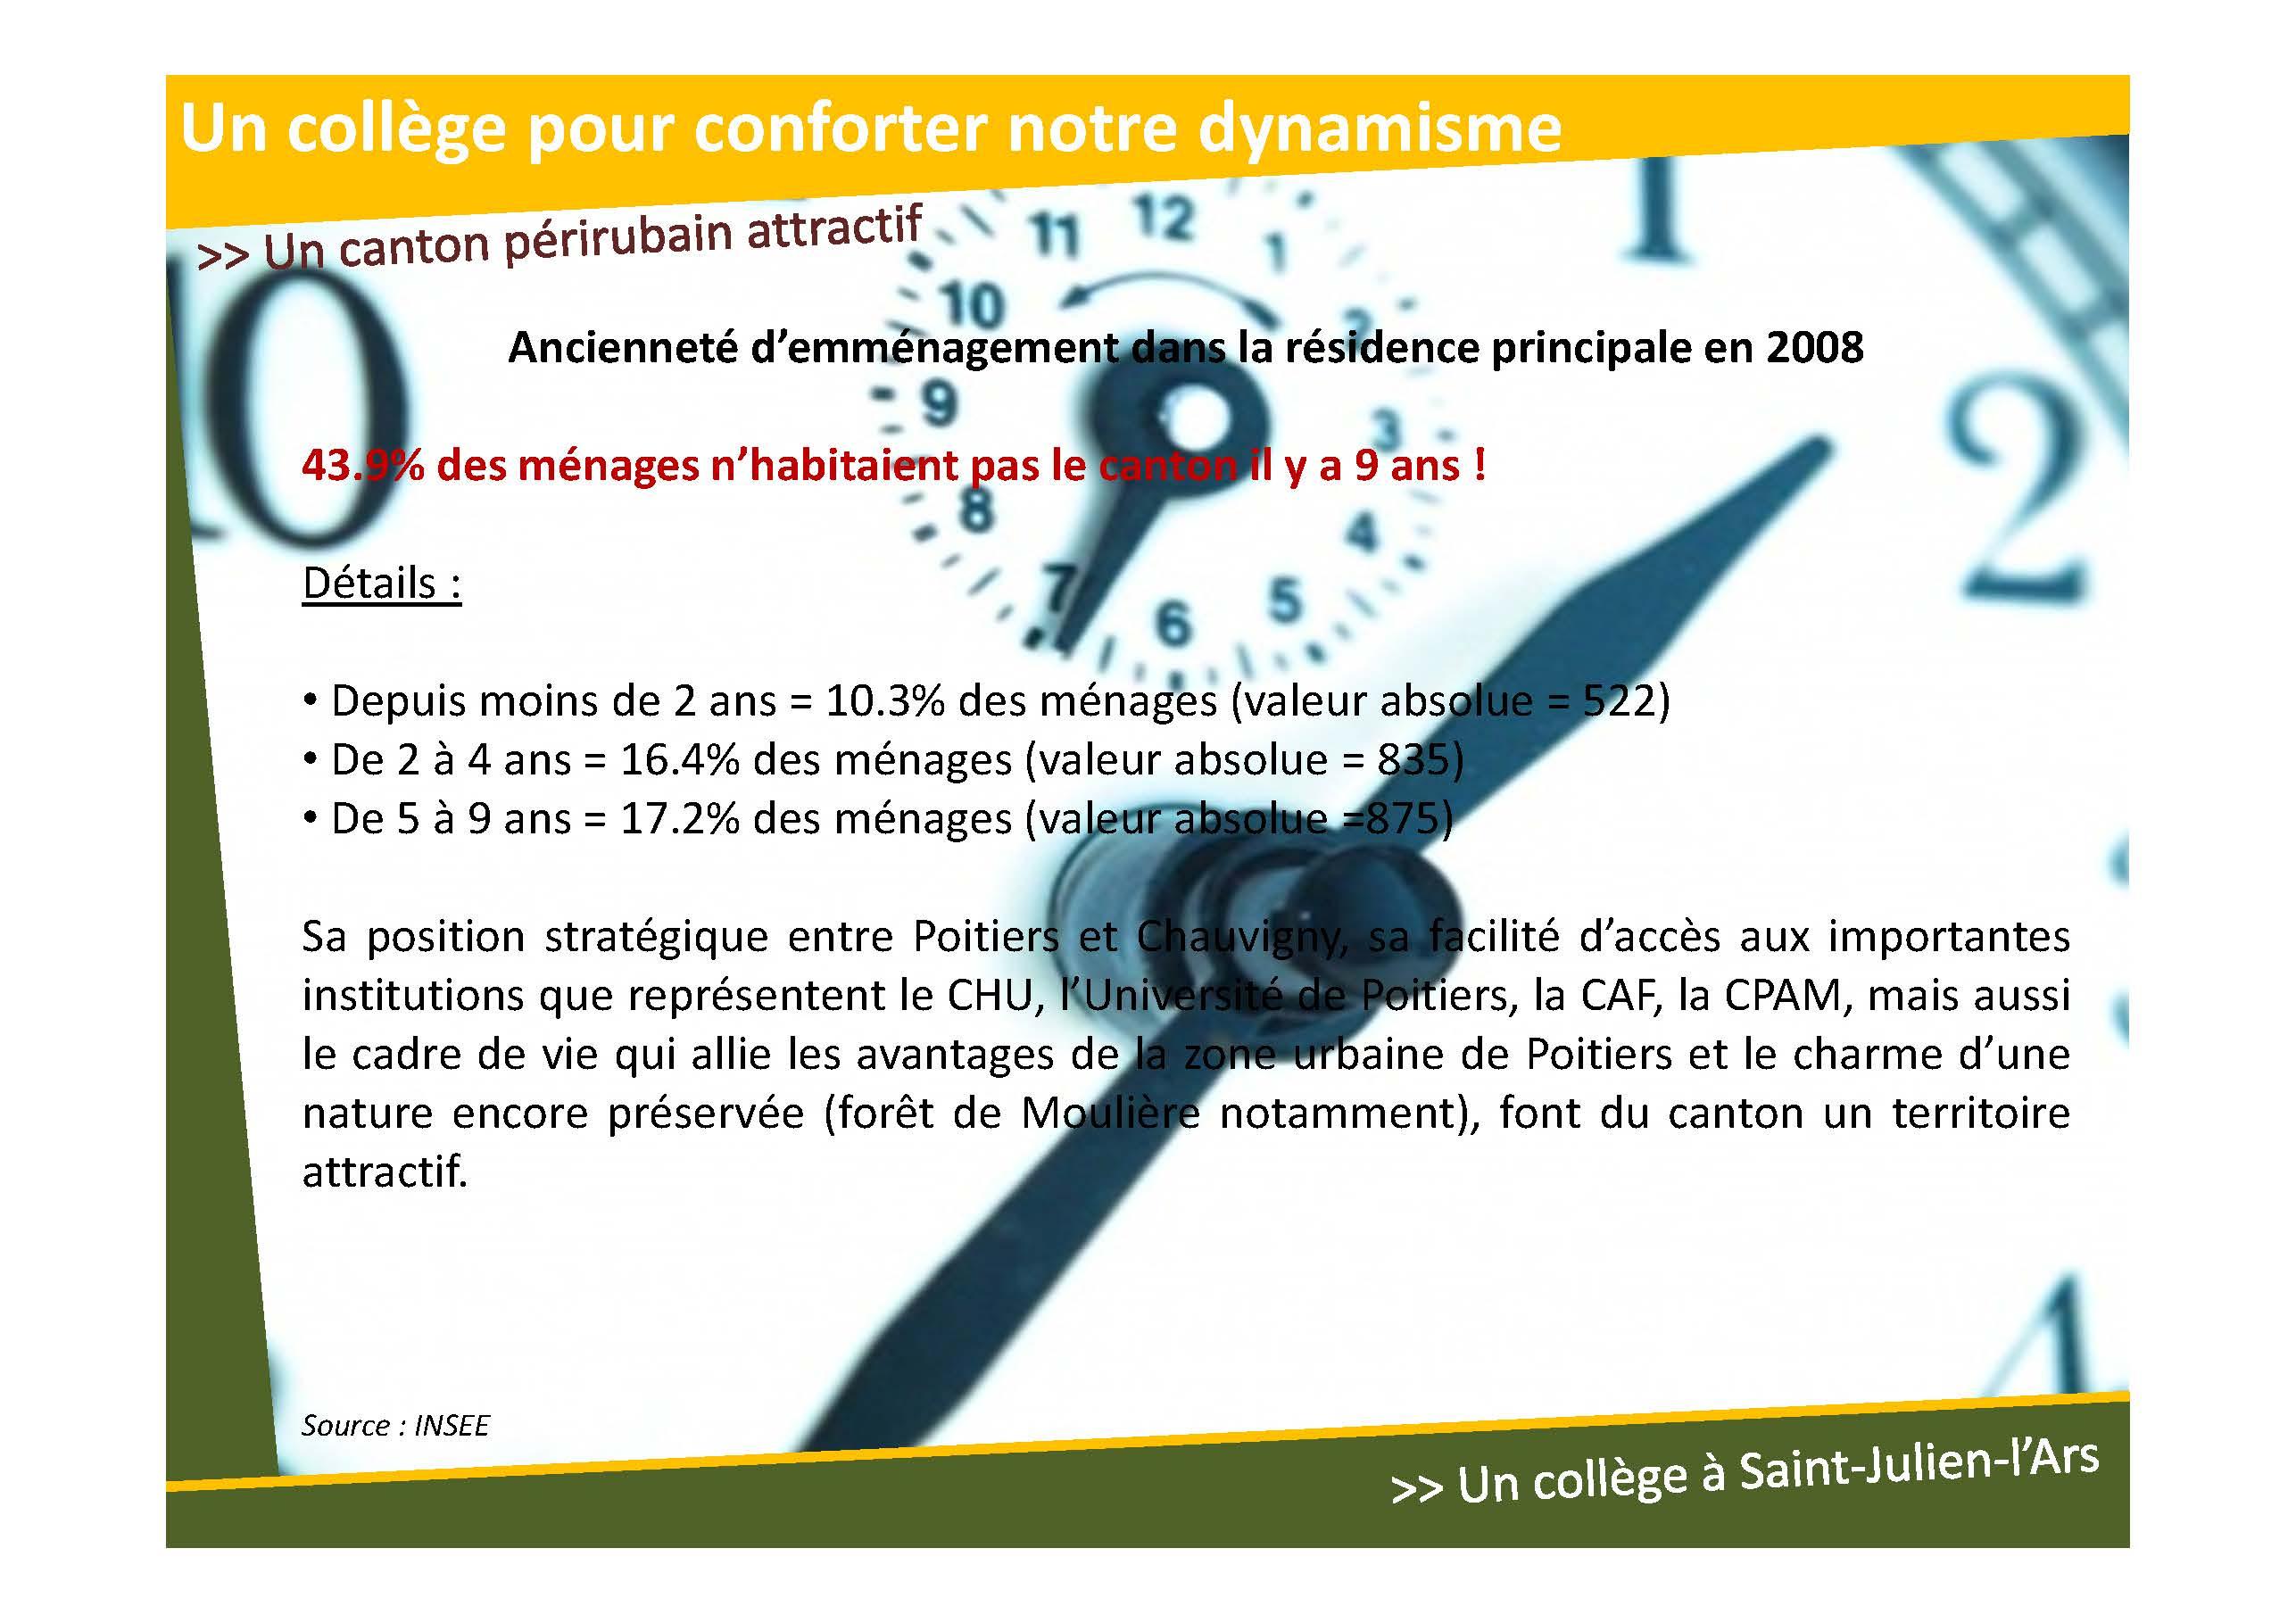 xaviermoinier-college_page_16